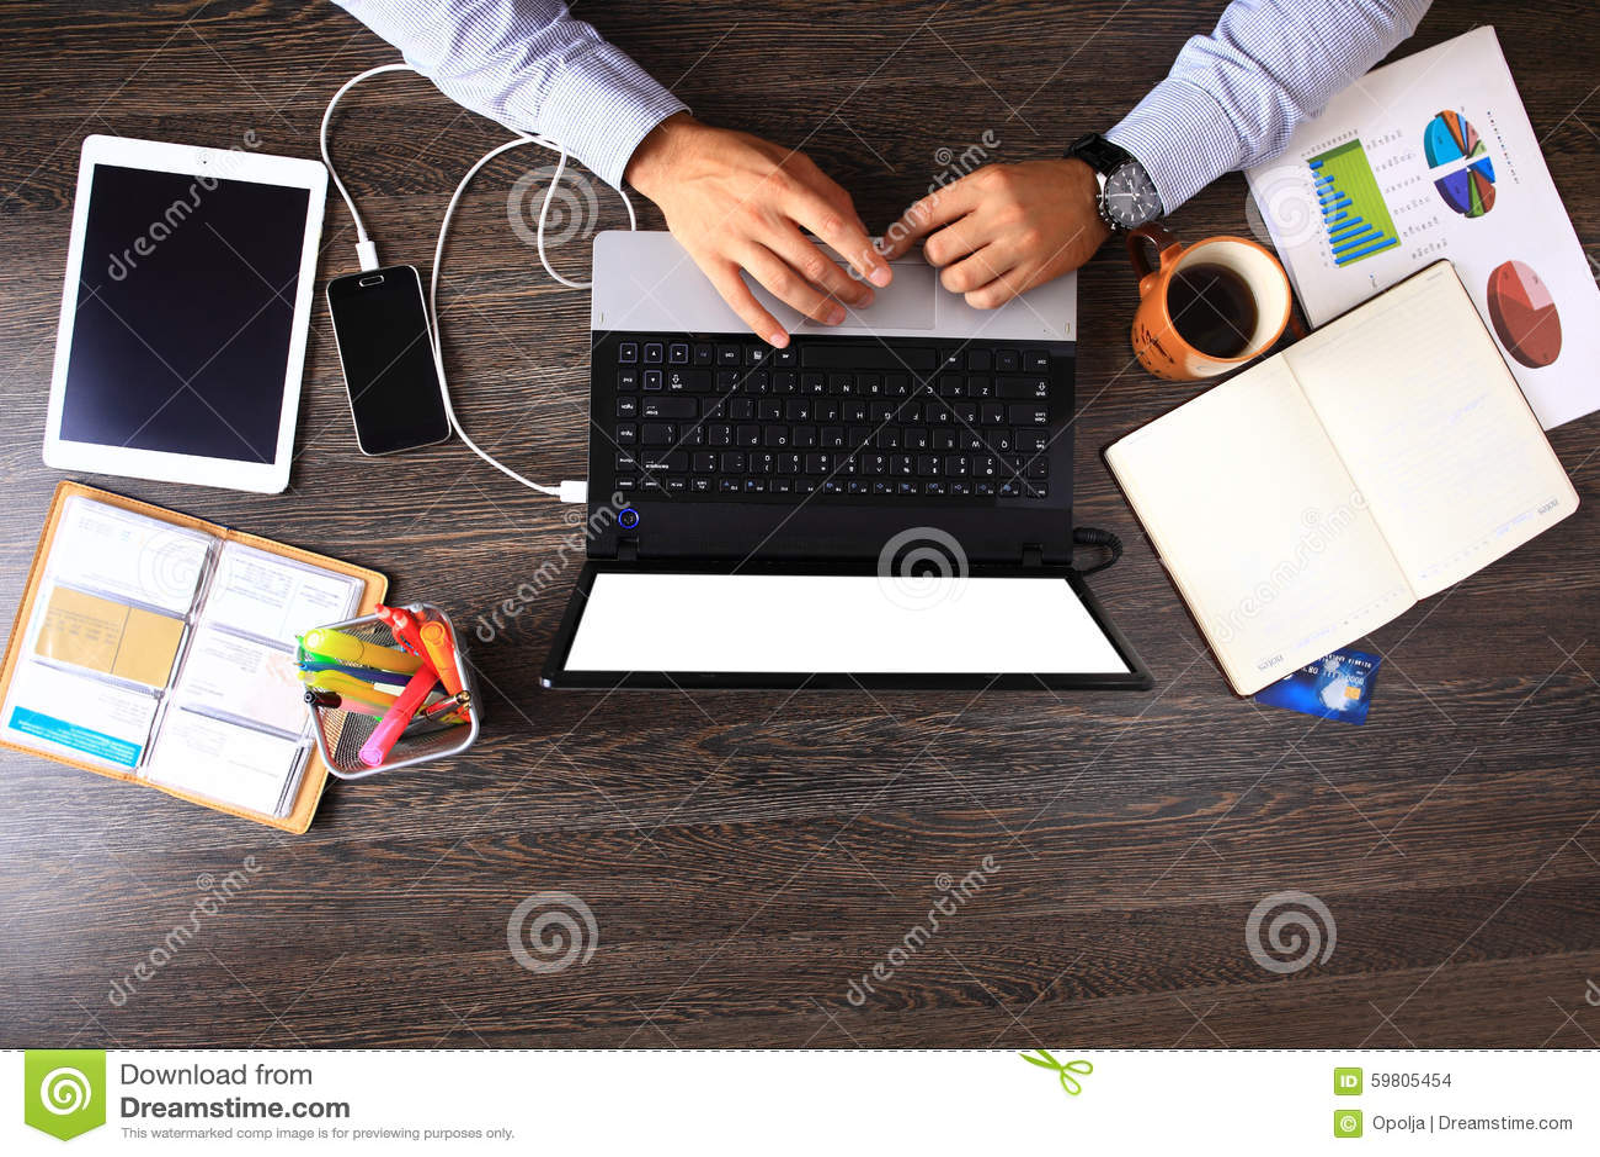 Vintage hipster wooden desktop top view, male hands using laptop